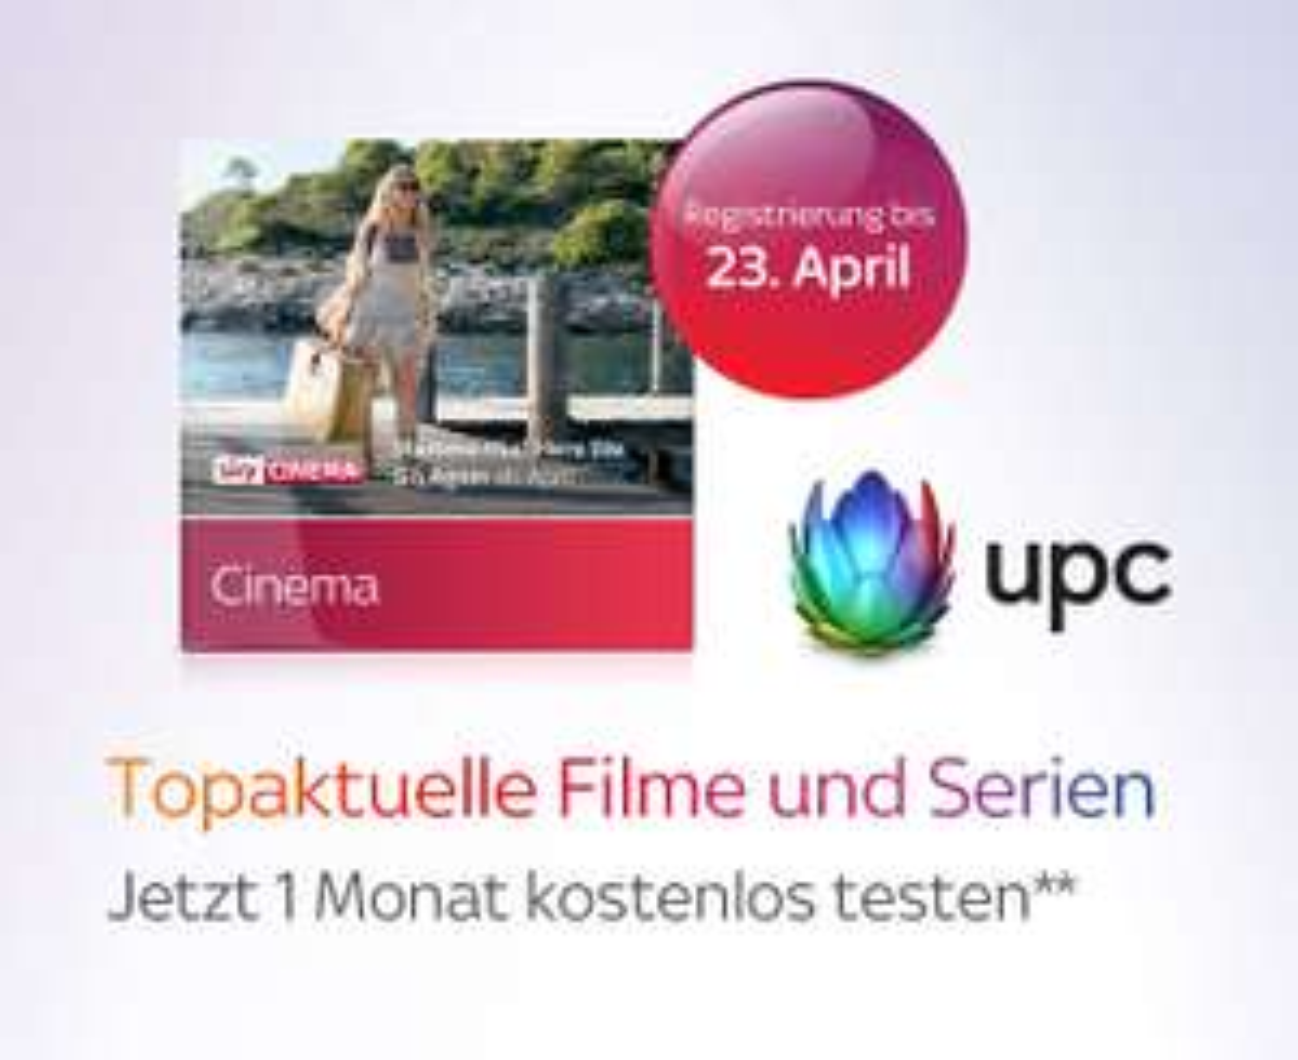 Sky Cinema 1 Monat kostenlos testen (UPC)